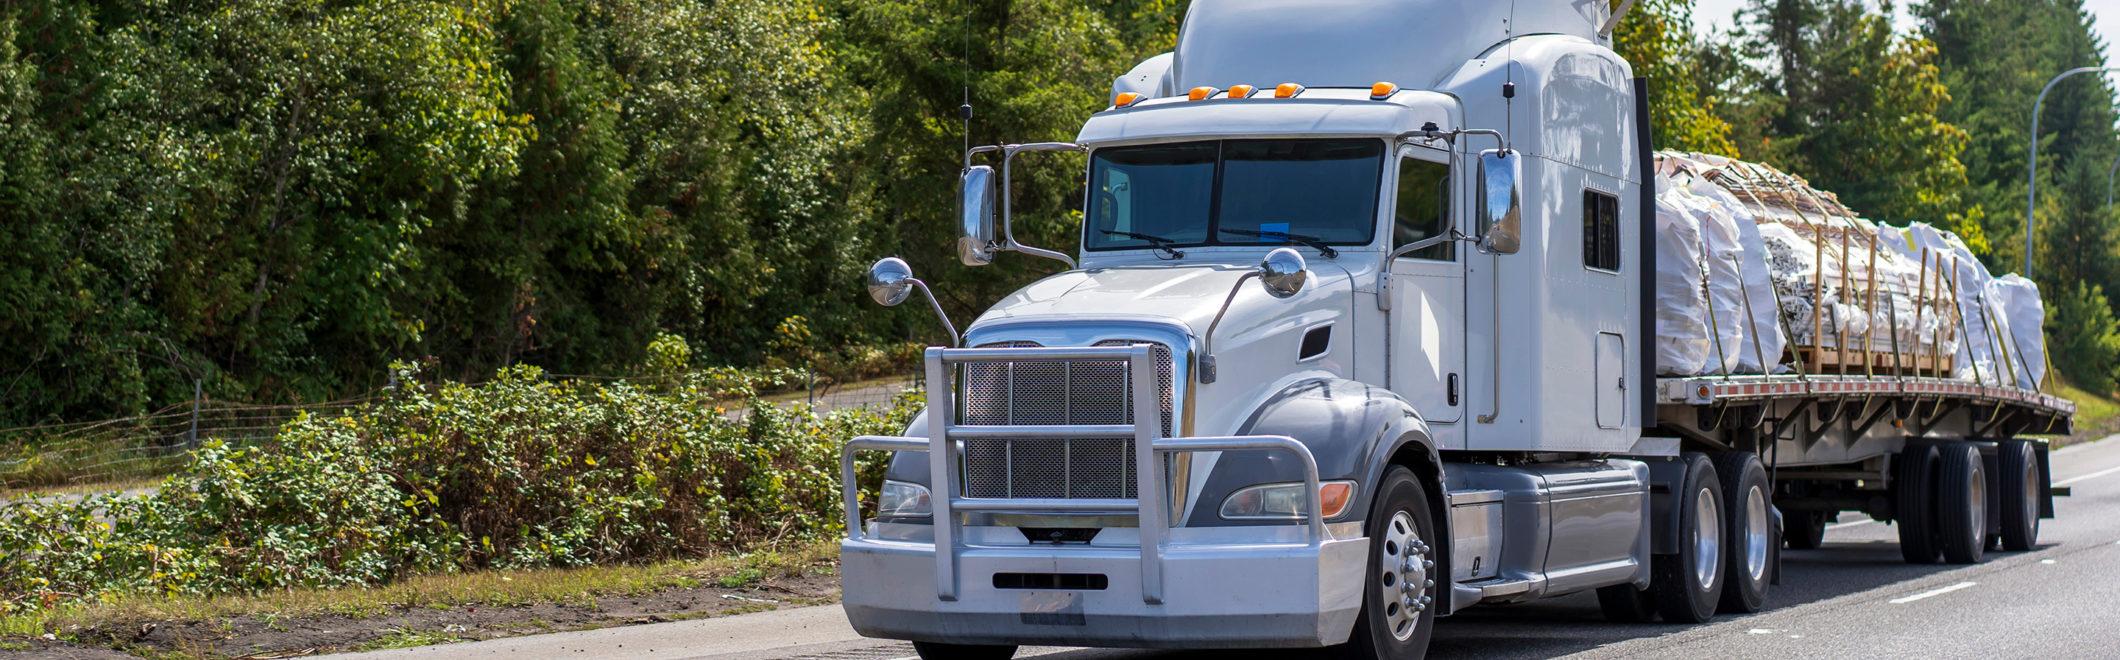 Sunline truckload